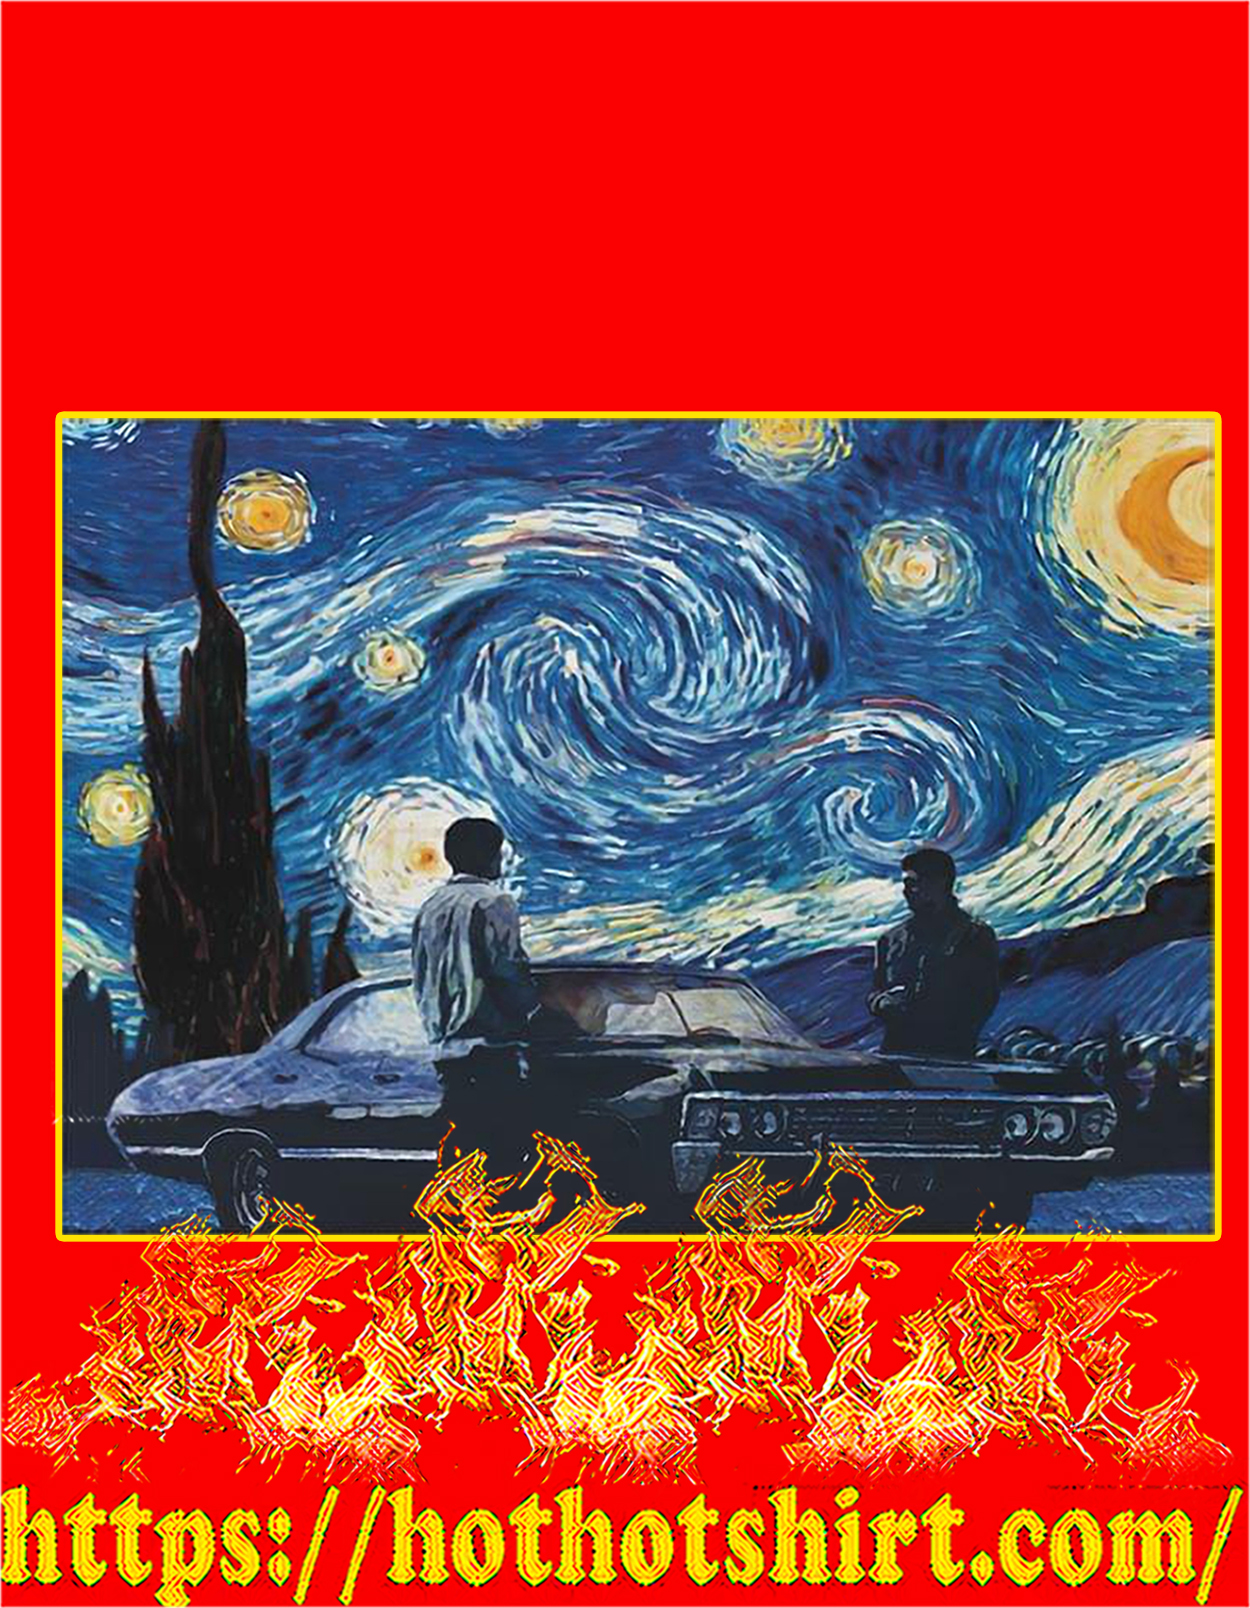 SupernaturaI starry night van gogh poster - A3